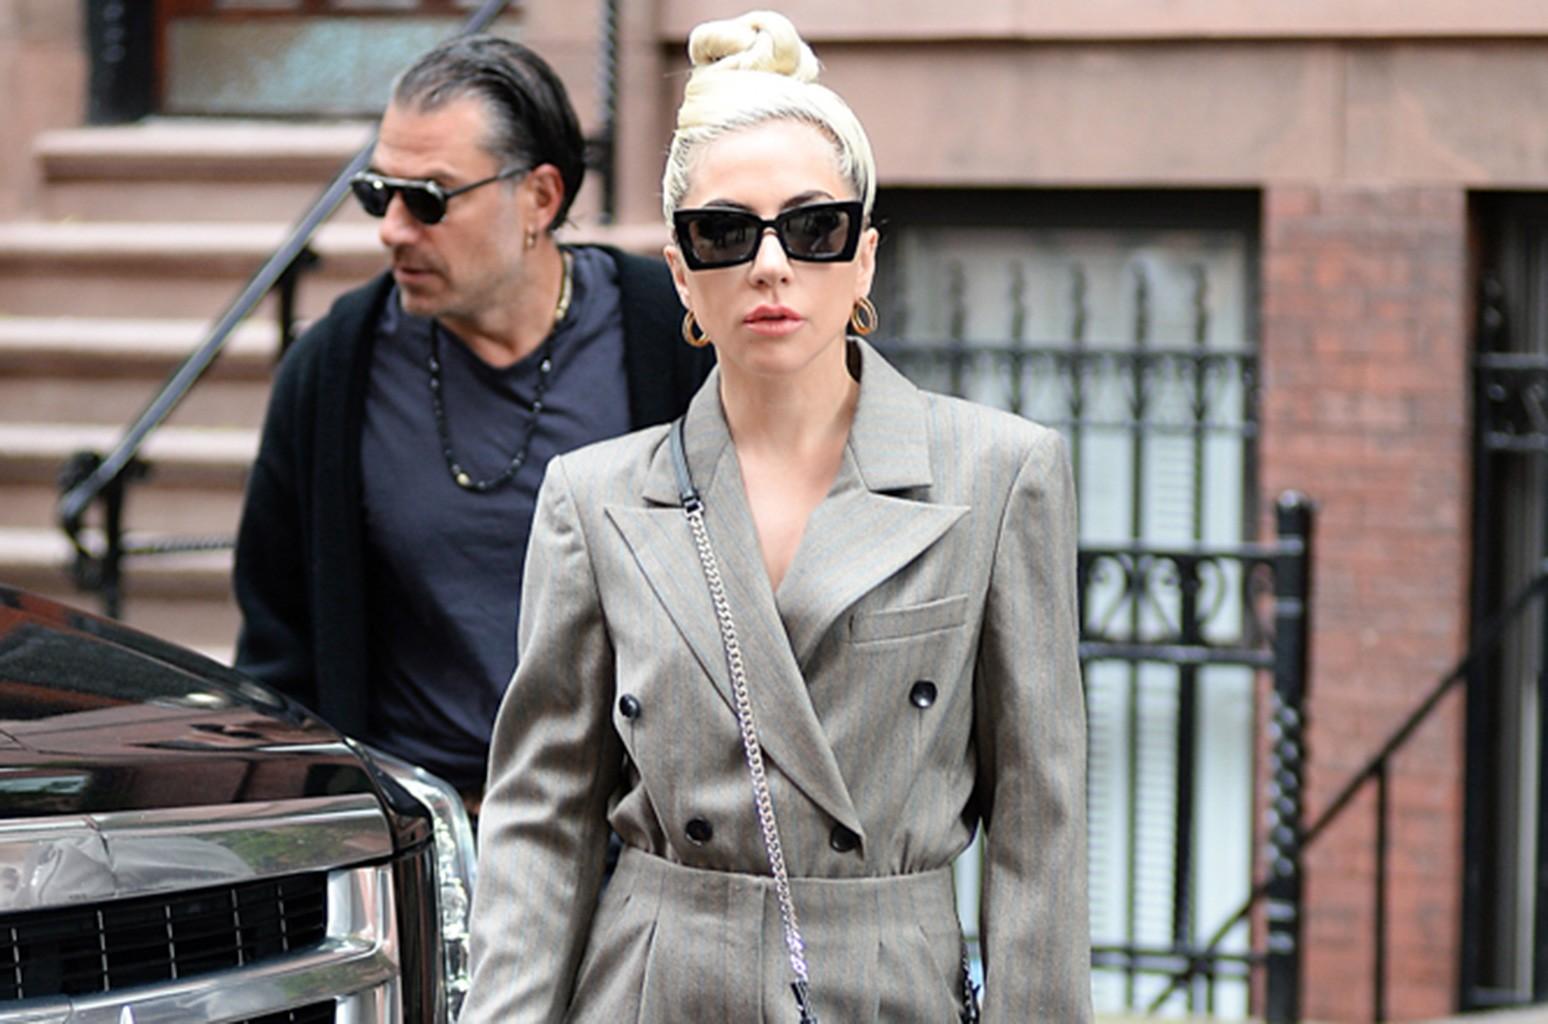 Lady Gaga arrives at Electric Lady Studios.